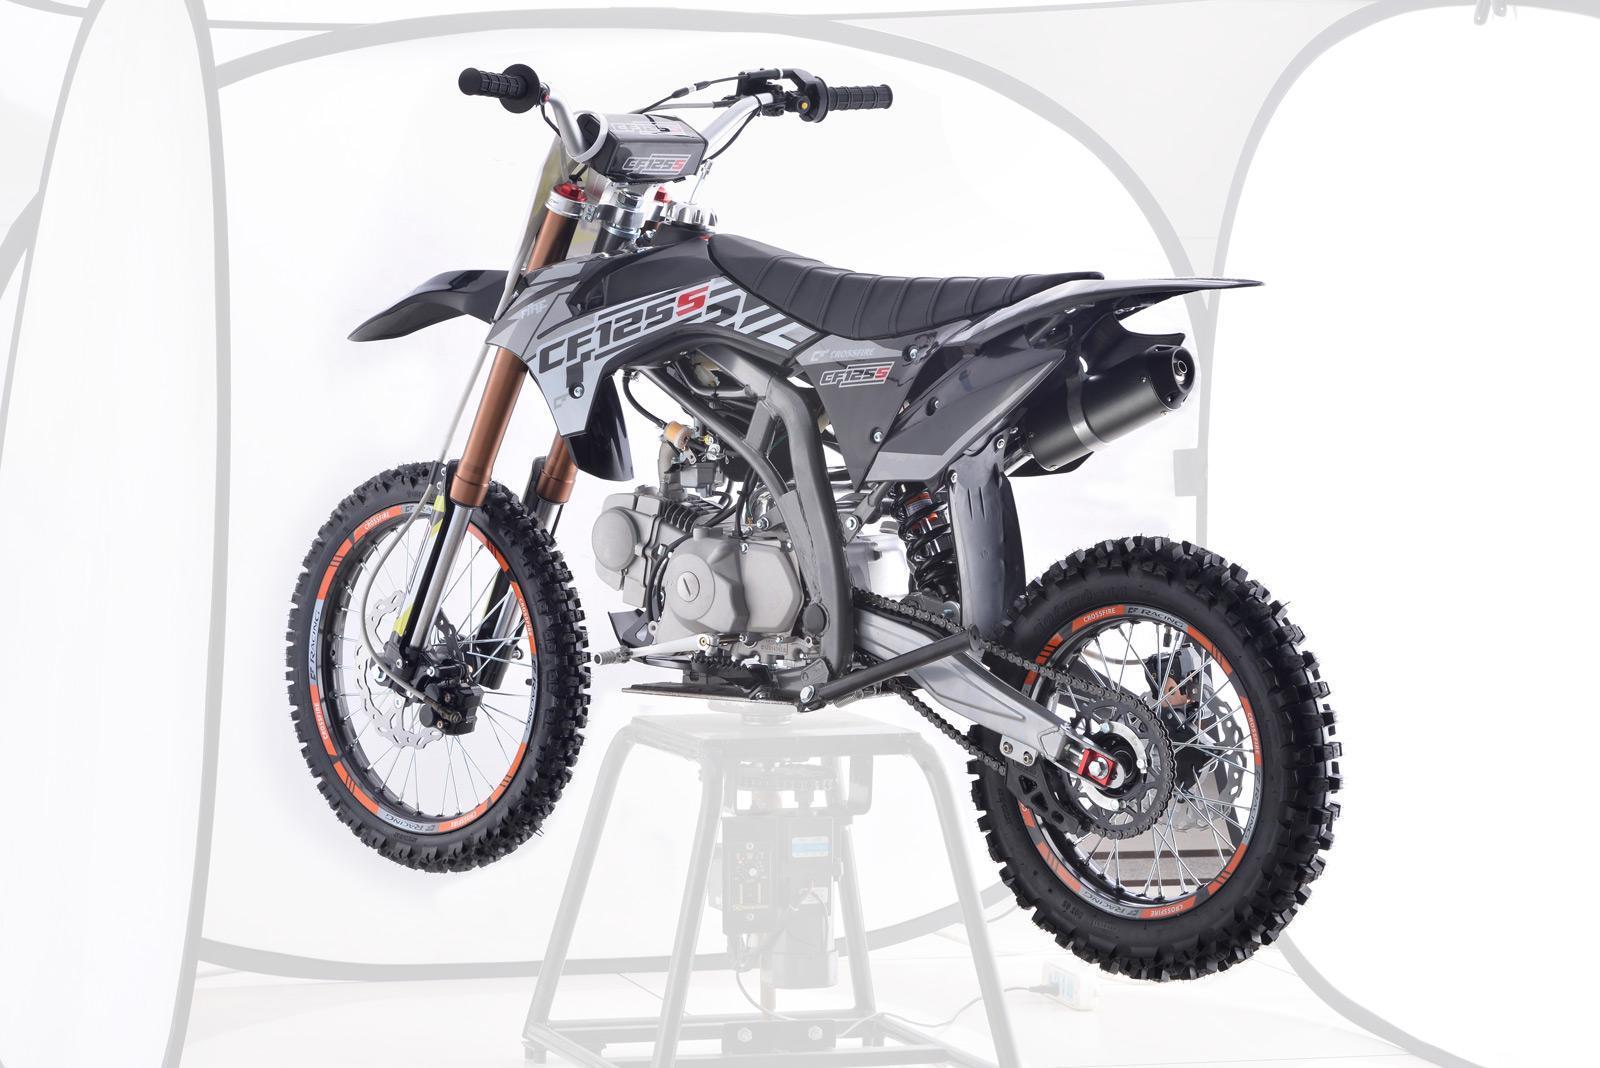 Crossfire CF125S Motorbike Black - dirt bikes store lockyer valley